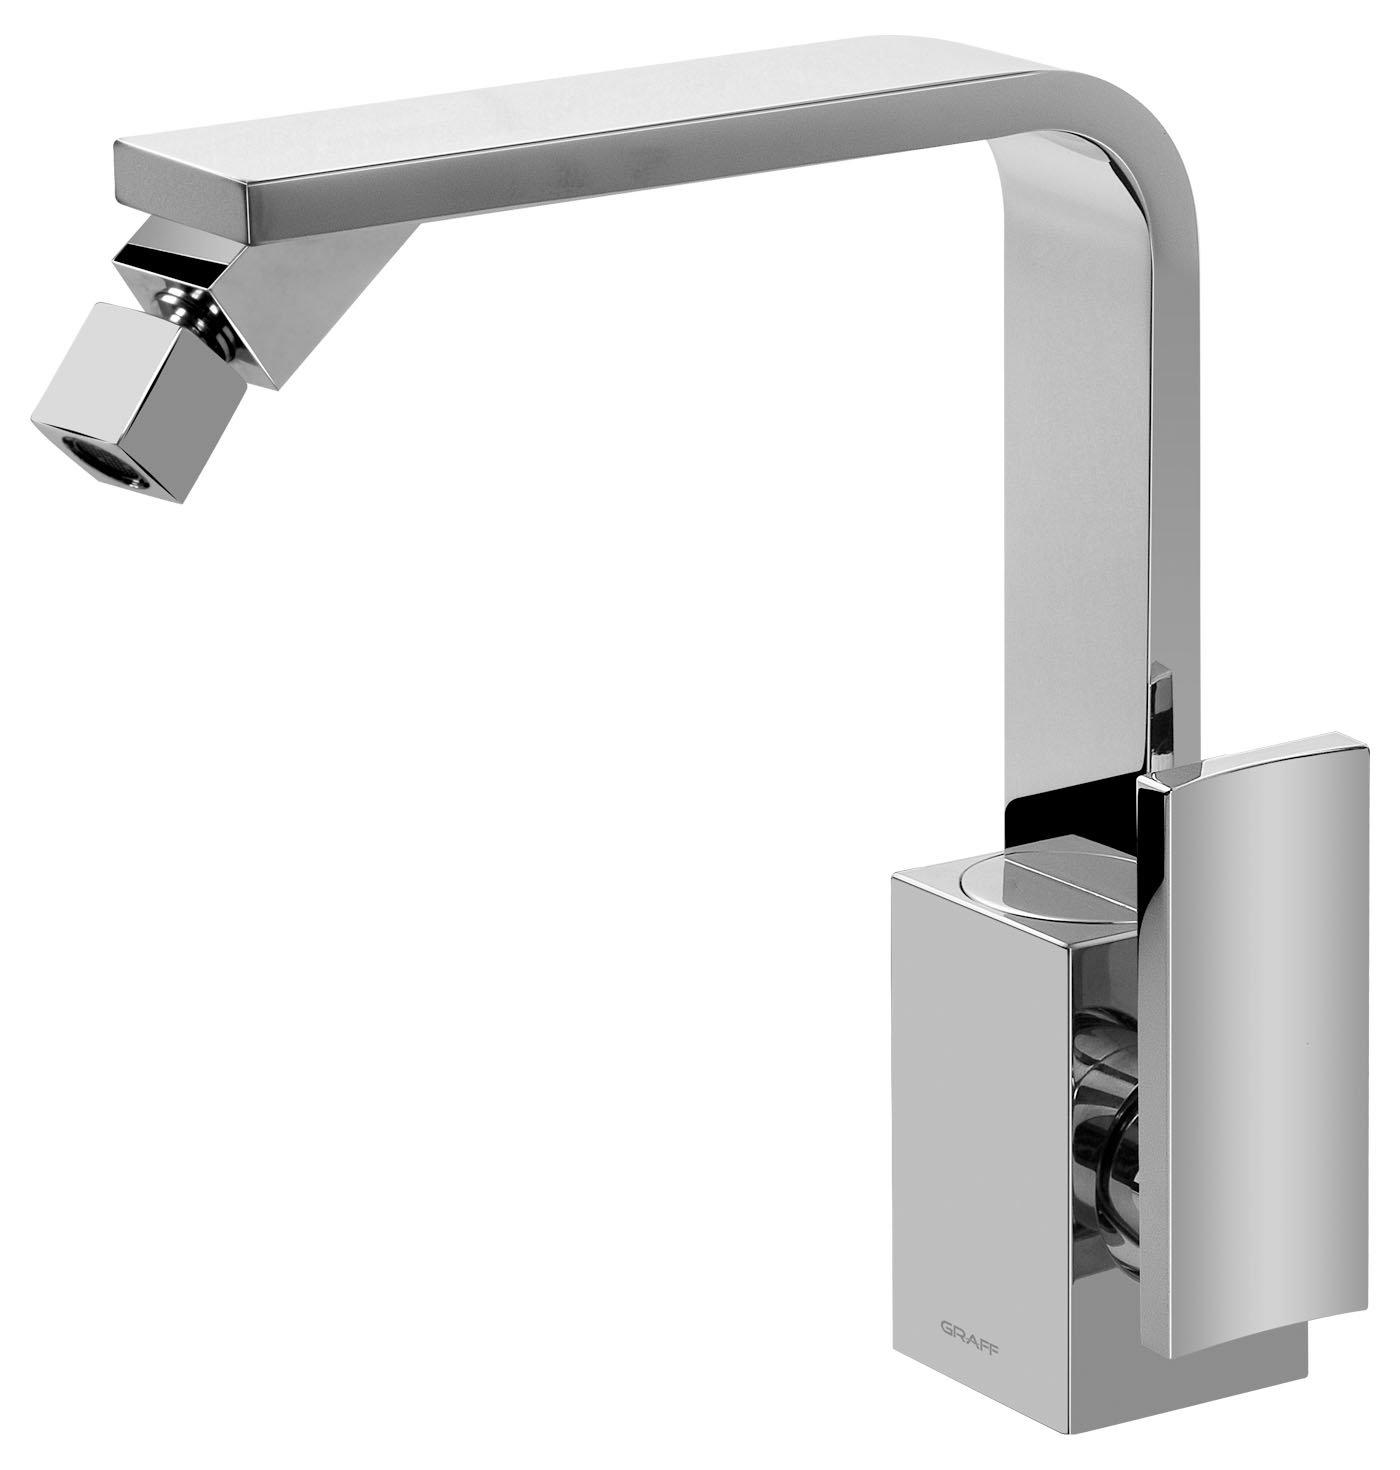 high-quality Graff G-3660-LM36-SN Targa Bidet Faucet